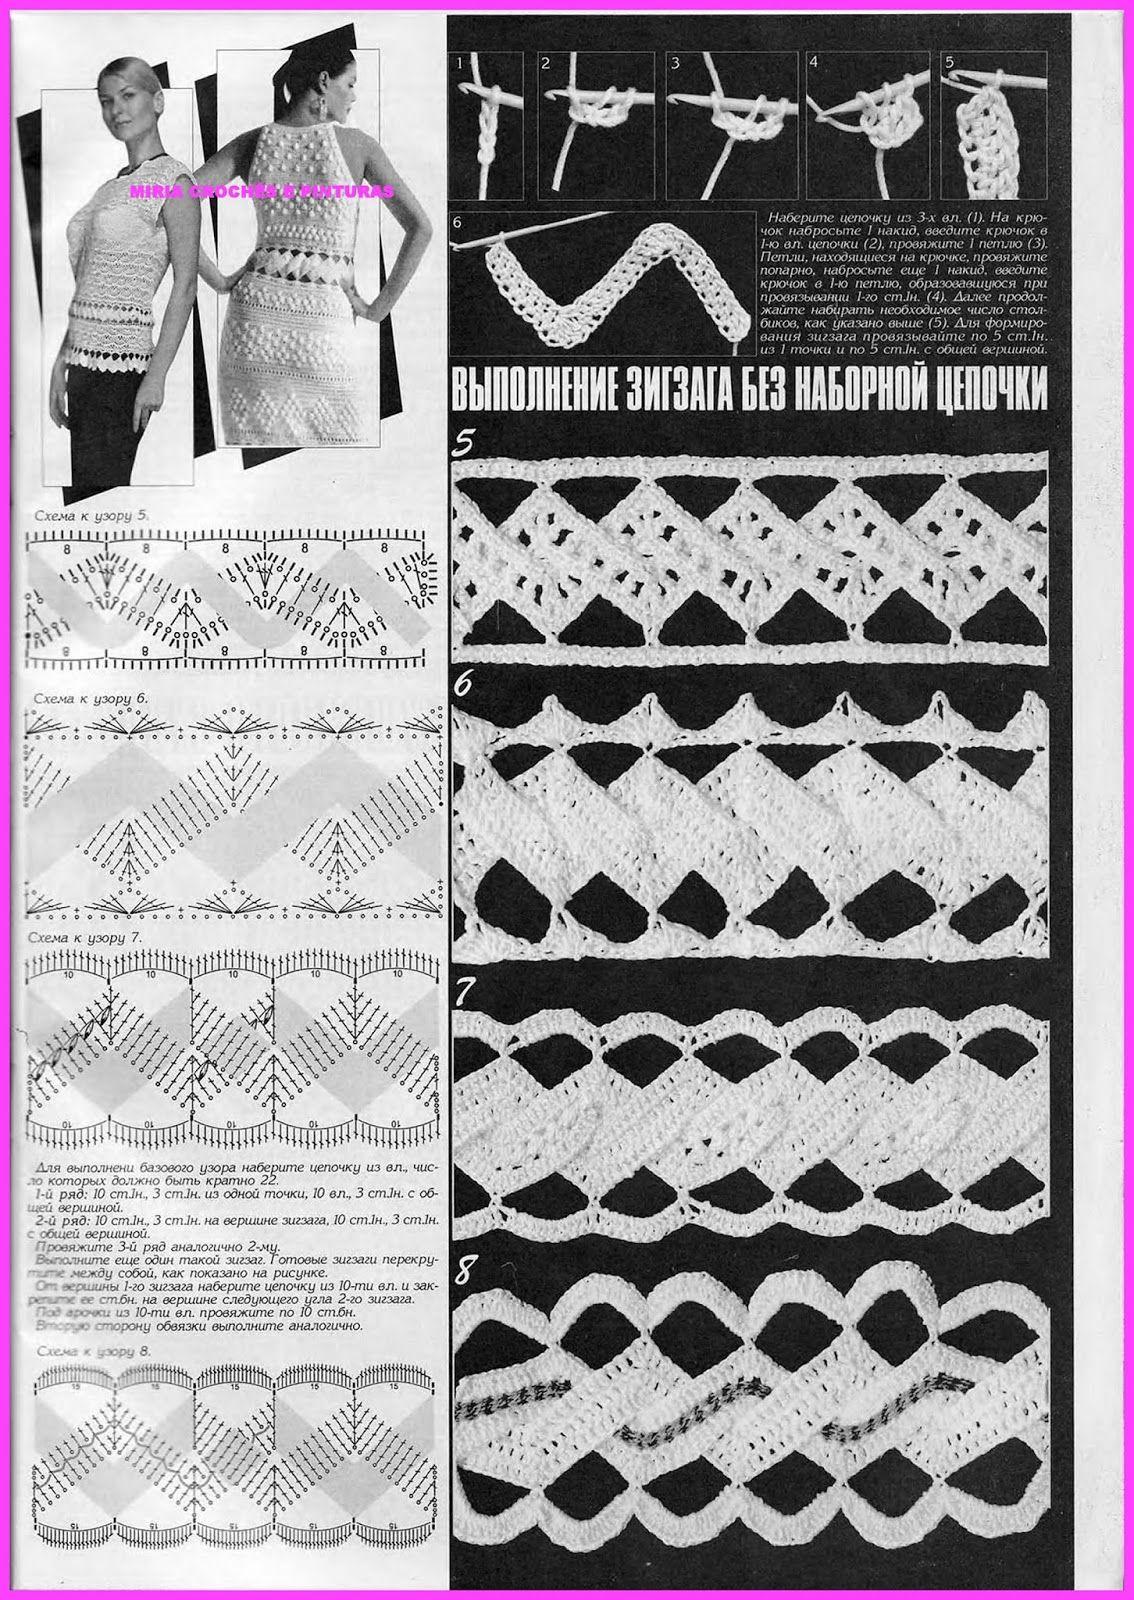 MIRIA CROCHÊS E PINTURAS: BORDAS DE CROCHÊ DE FILÉ N° 689 | crochet ...